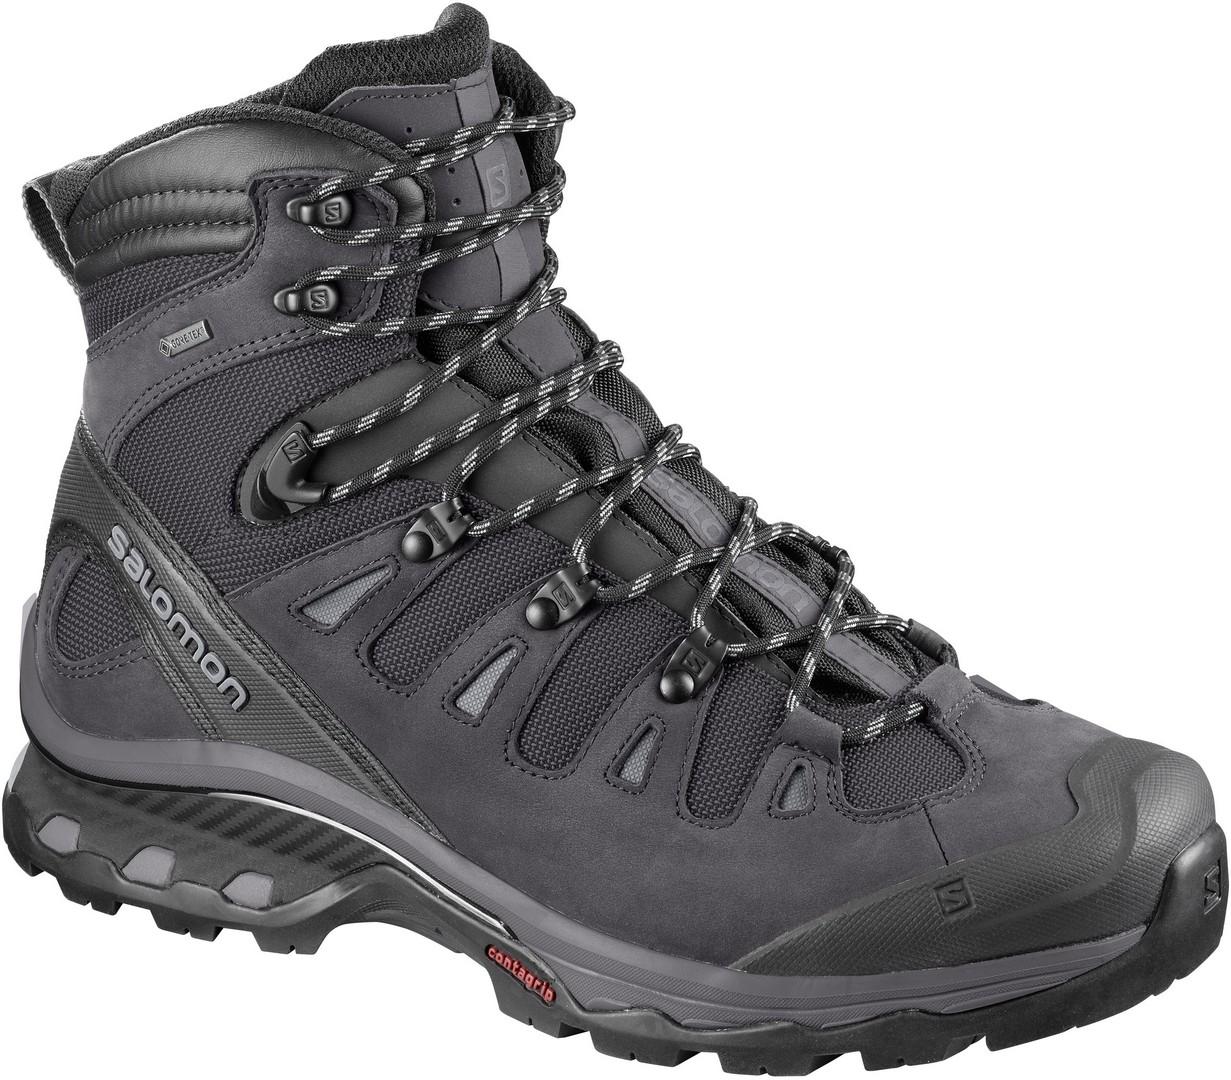 Salomon QUEST 4D 3 GTX, muške cipele za planinarenje, crna